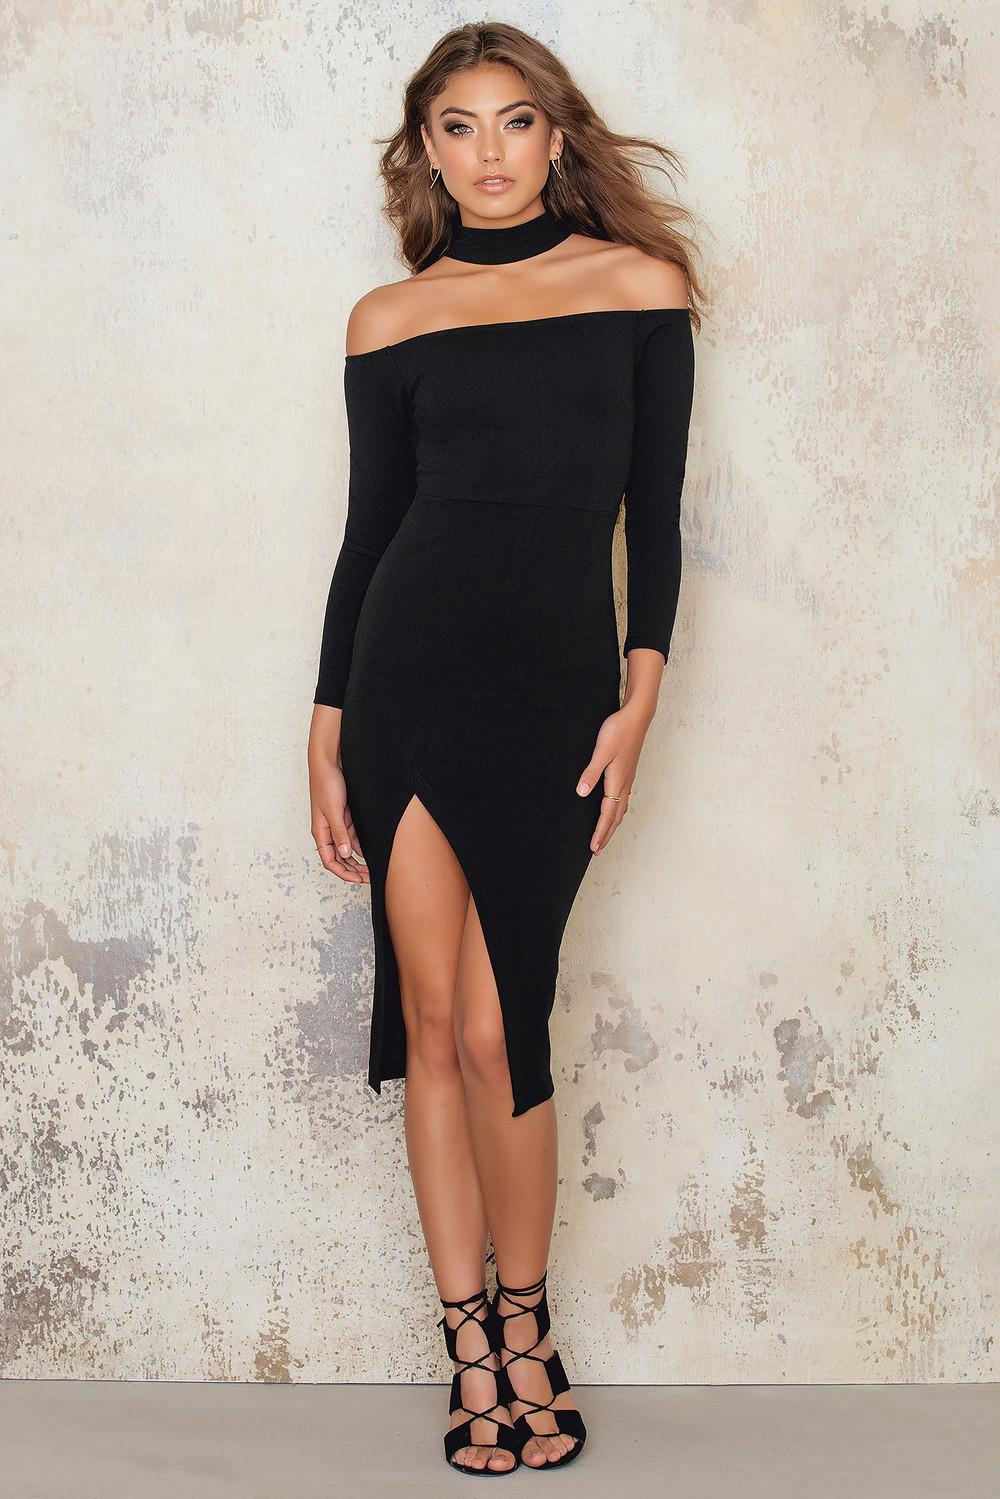 NaaNaa Off Shoulder Midi Dress Choker Neck Thigh Split